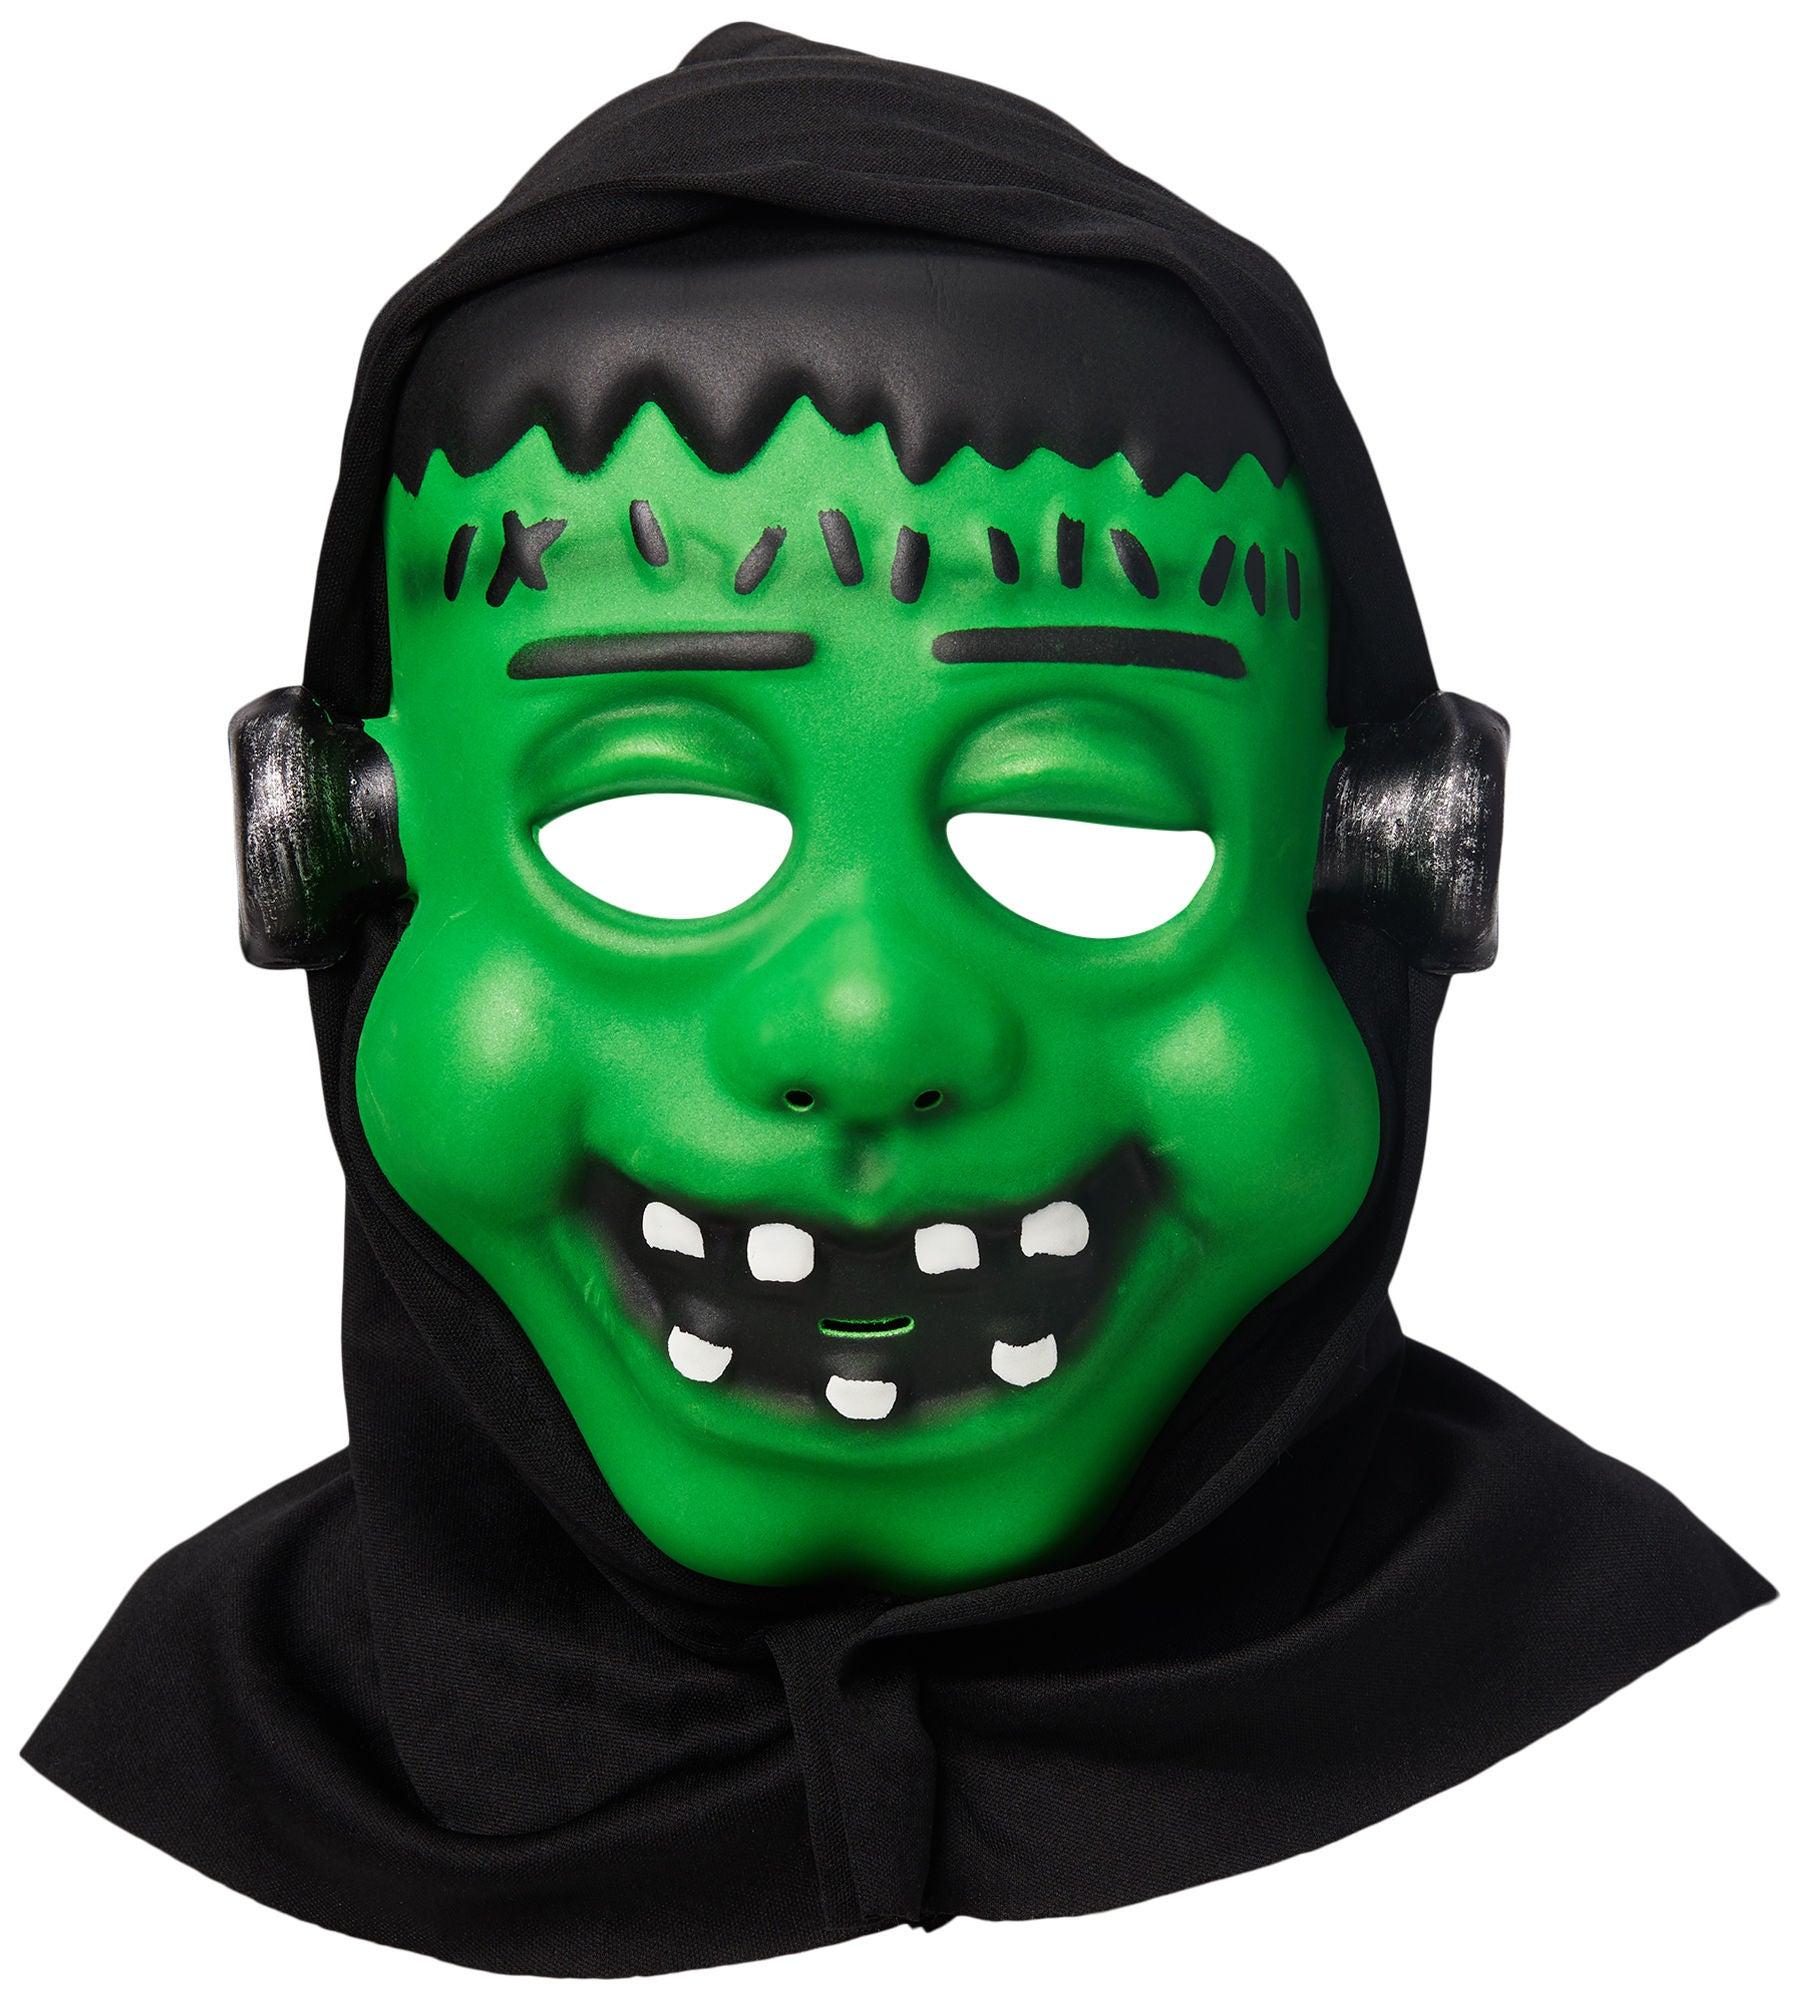 Hupullinen Naamari Frankenstein